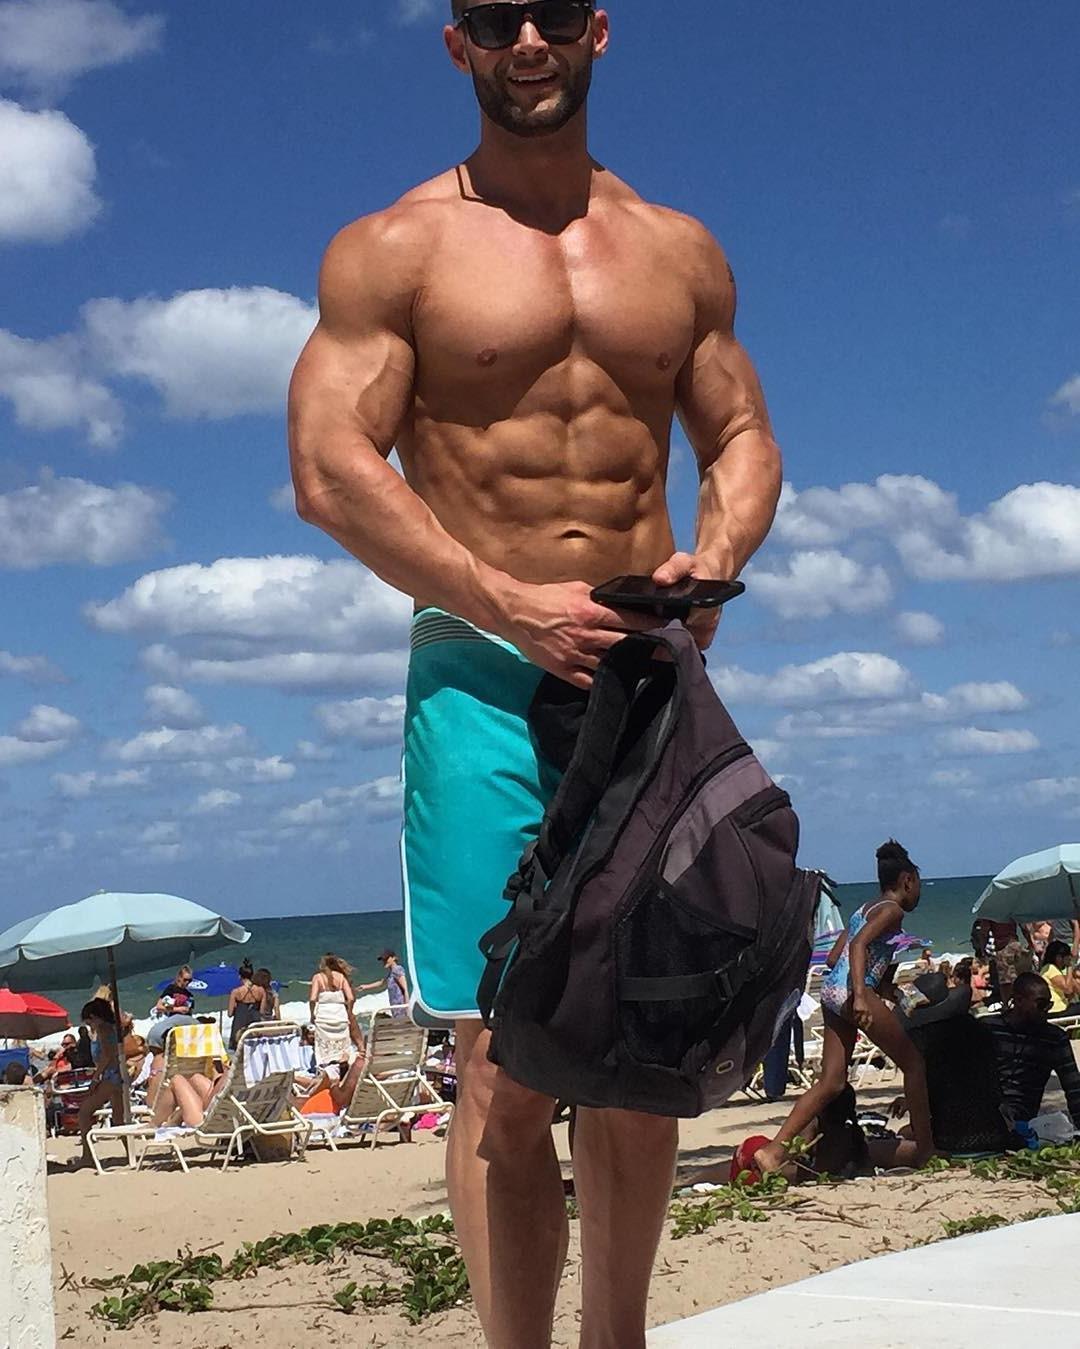 muscular-barechest-guys-whitney-reid-beach-men